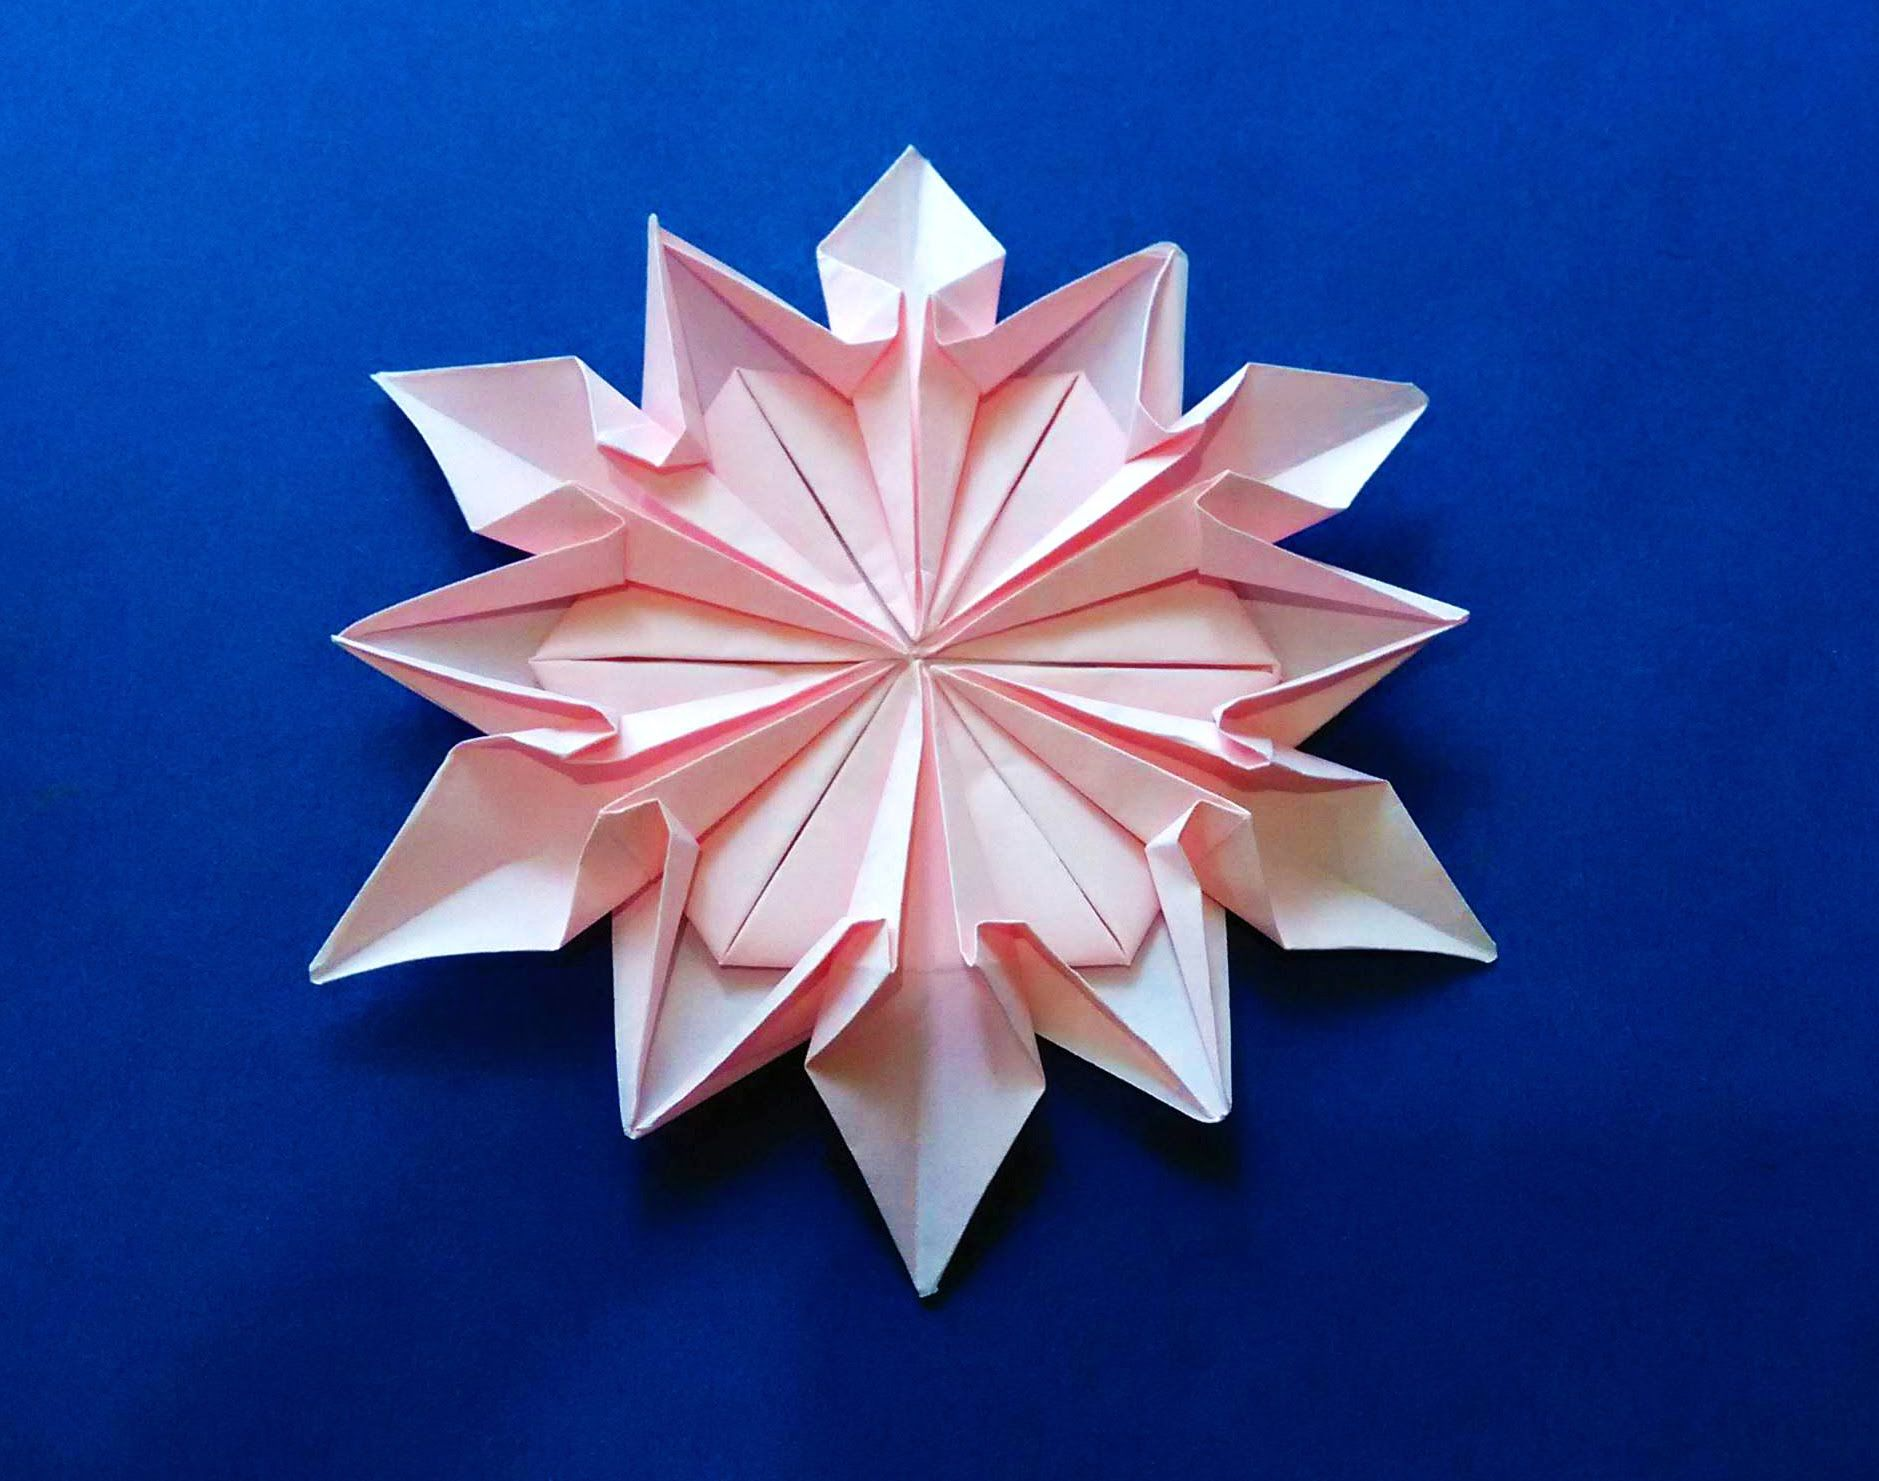 origami 12 petals flower origami snowflake dennis walker